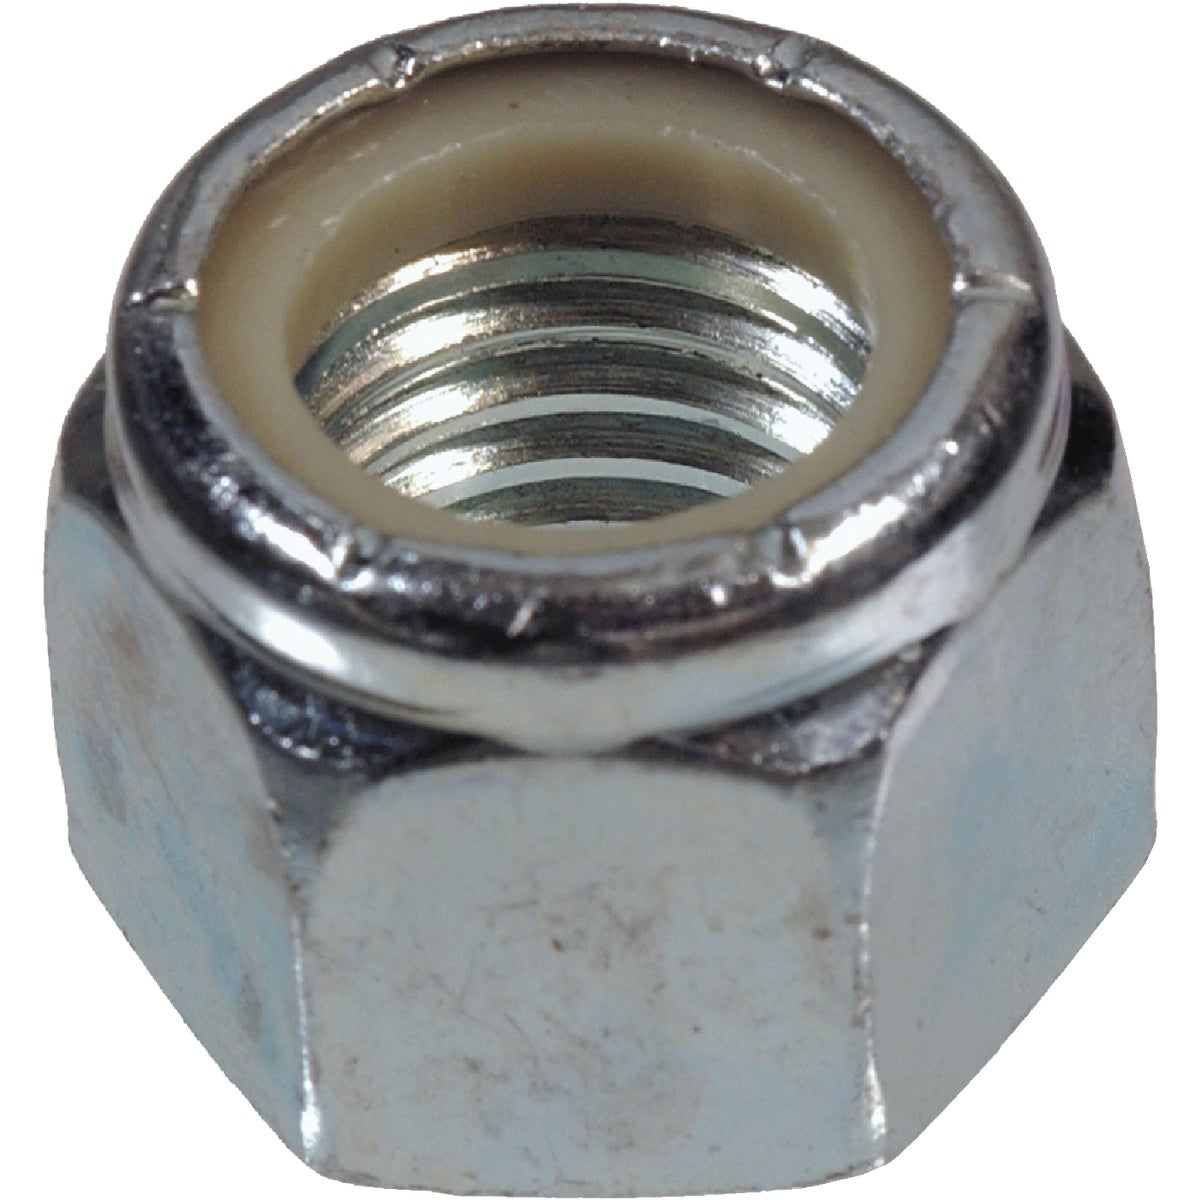 10-32 NYL INSRT LOCK NUT - 180144 by Hillman Fastener